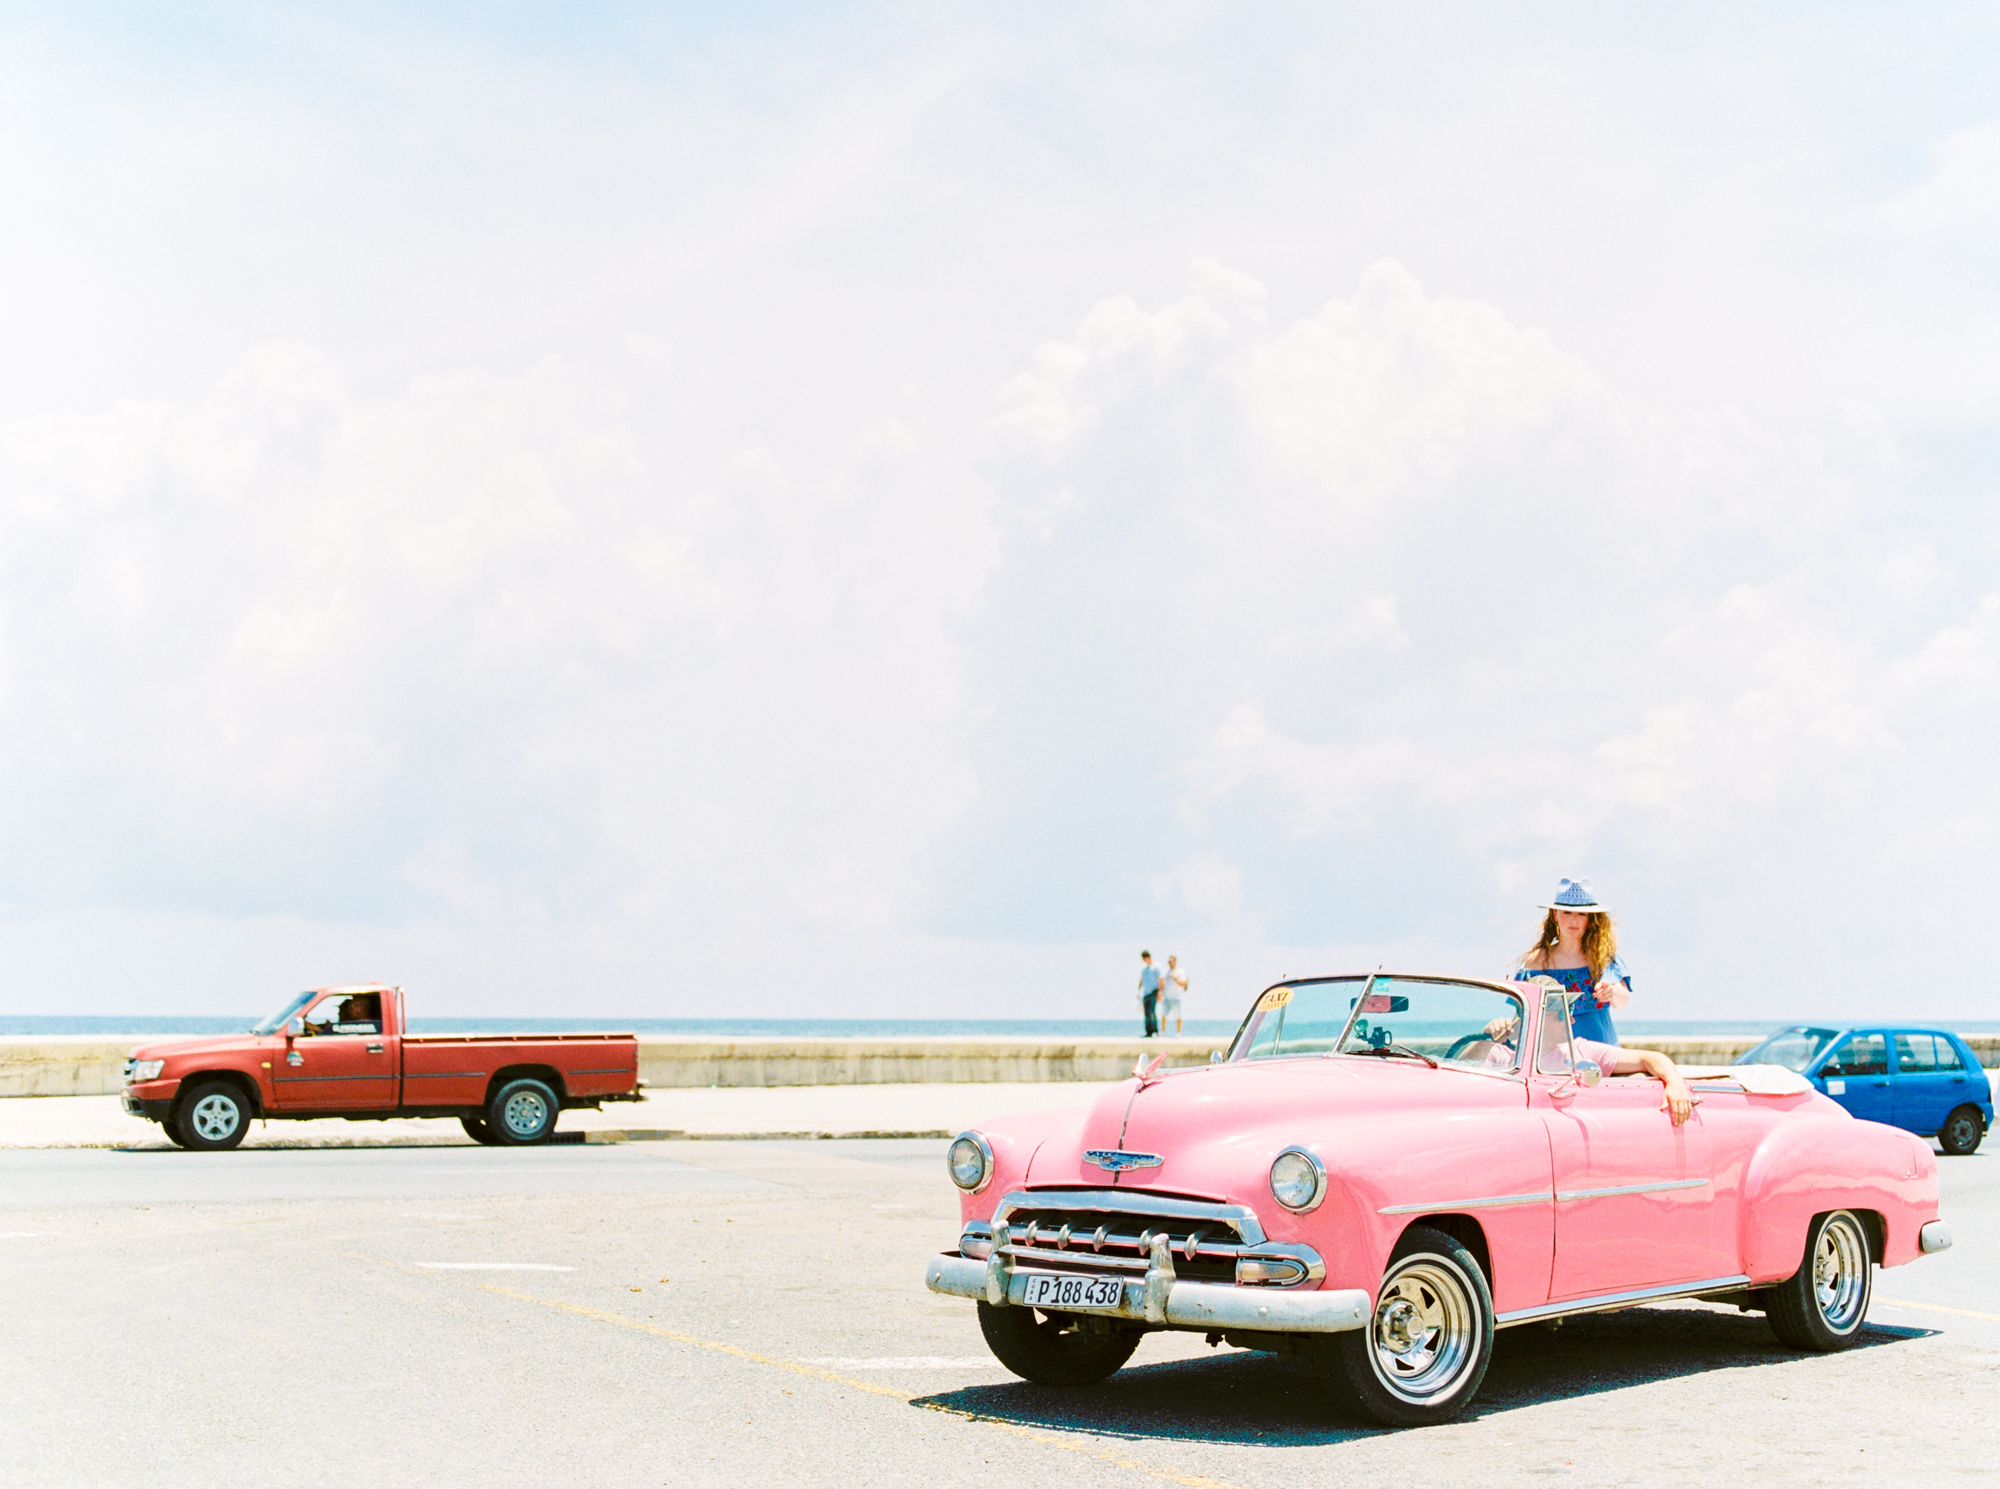 Erika Alvarenga Photography - Film 2018 - Travelling Photographer-84.jpg